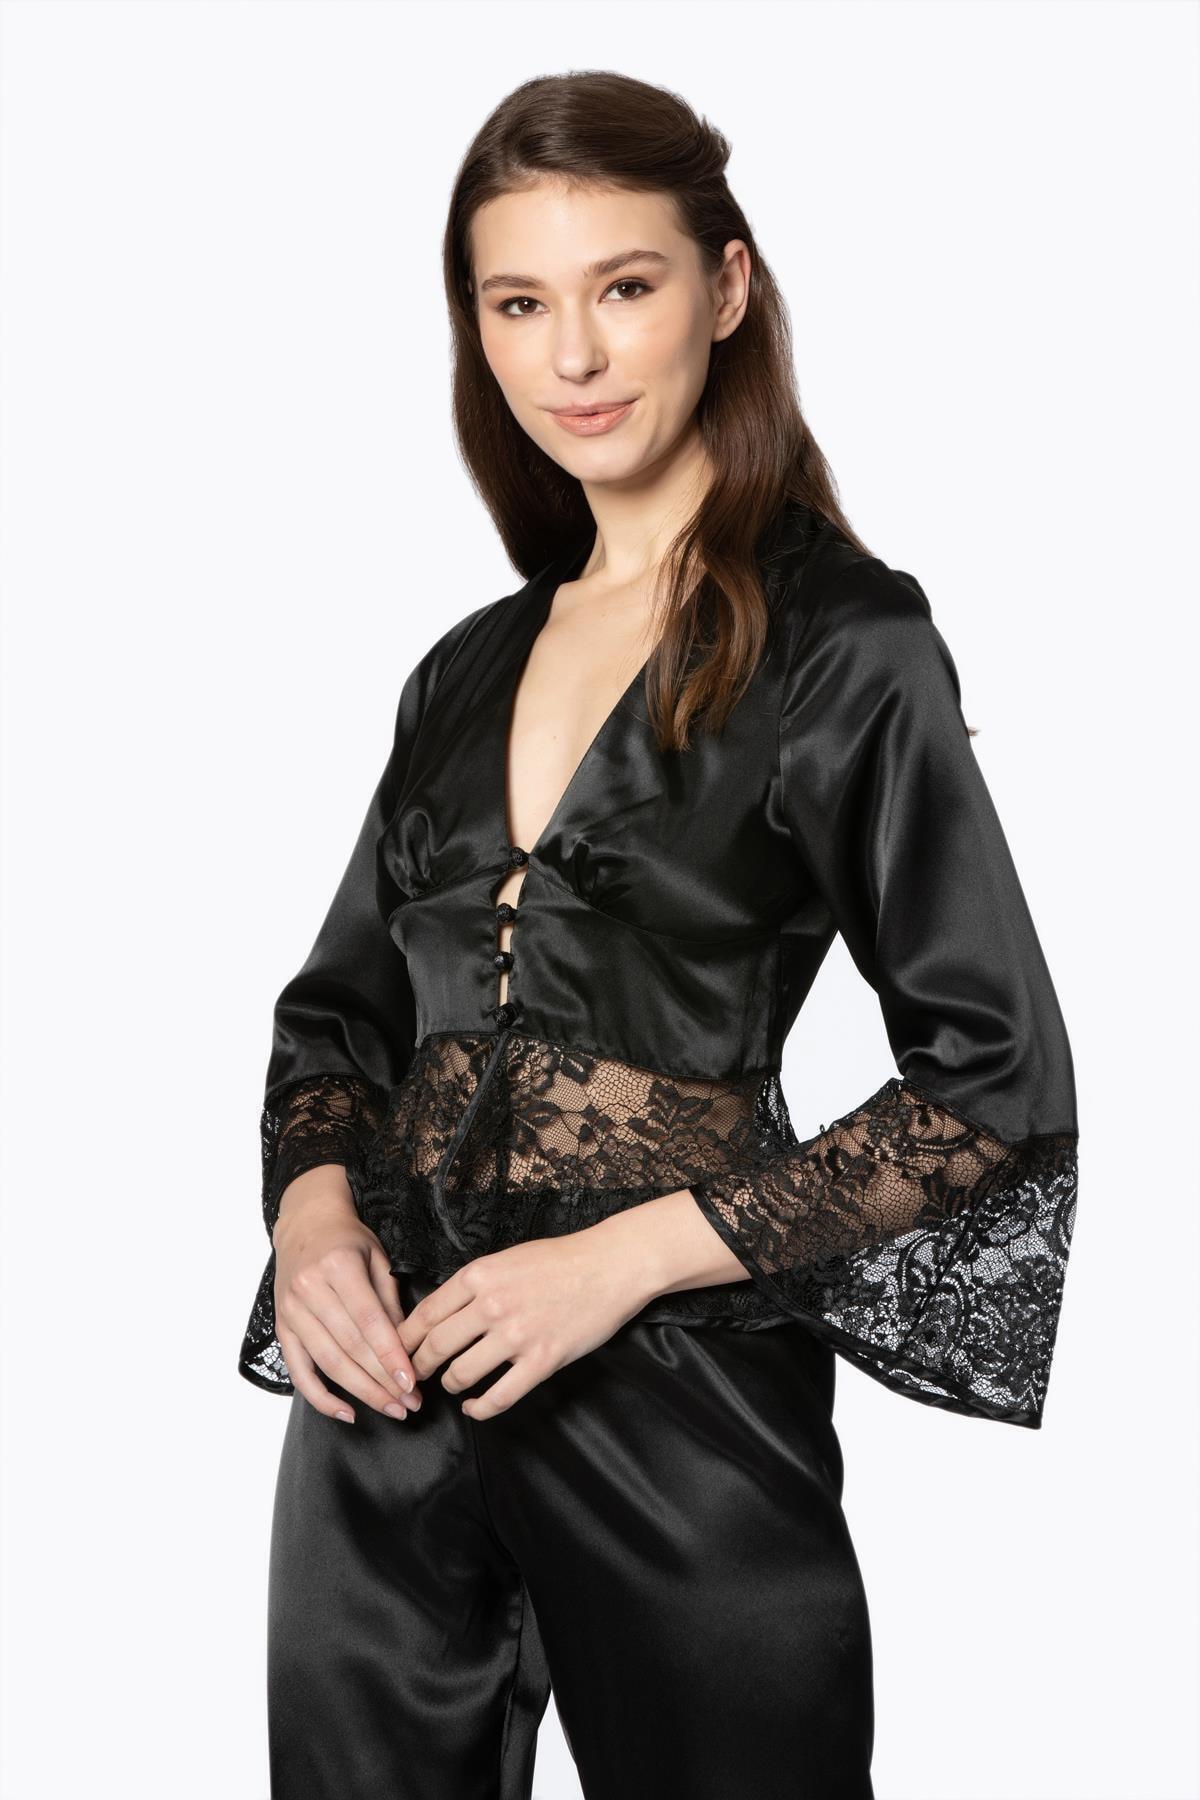 Black Sleepwear Female Satin 2 Piece Set Solid Women Pajamas Loose Pants Casual Home Suit Sets Nightwear best quality From Turke